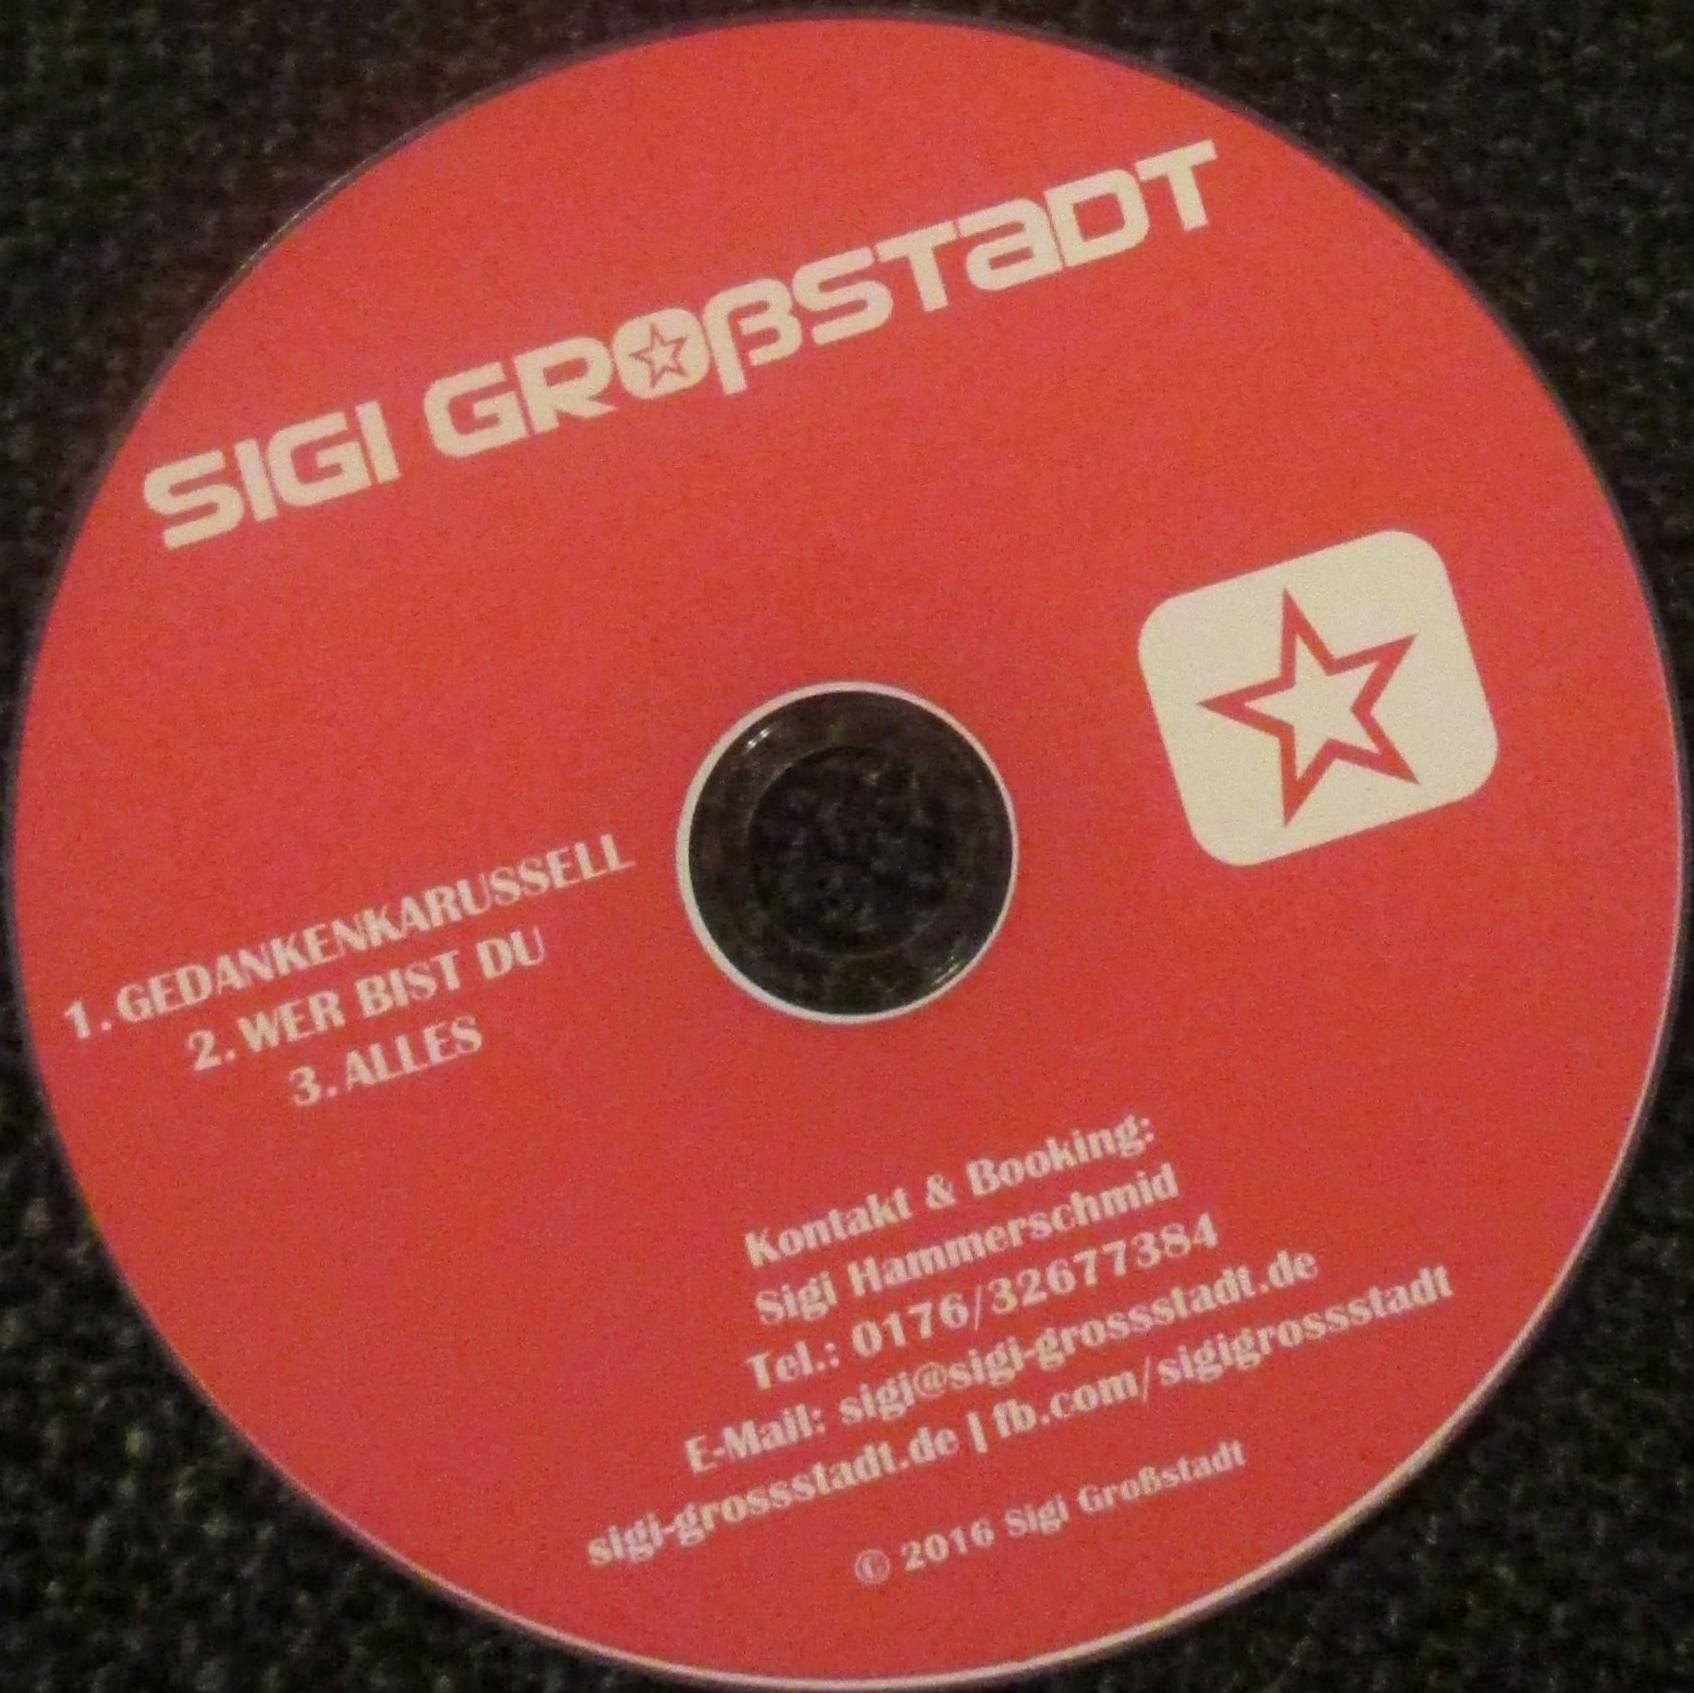 SigiGrosstadtEP